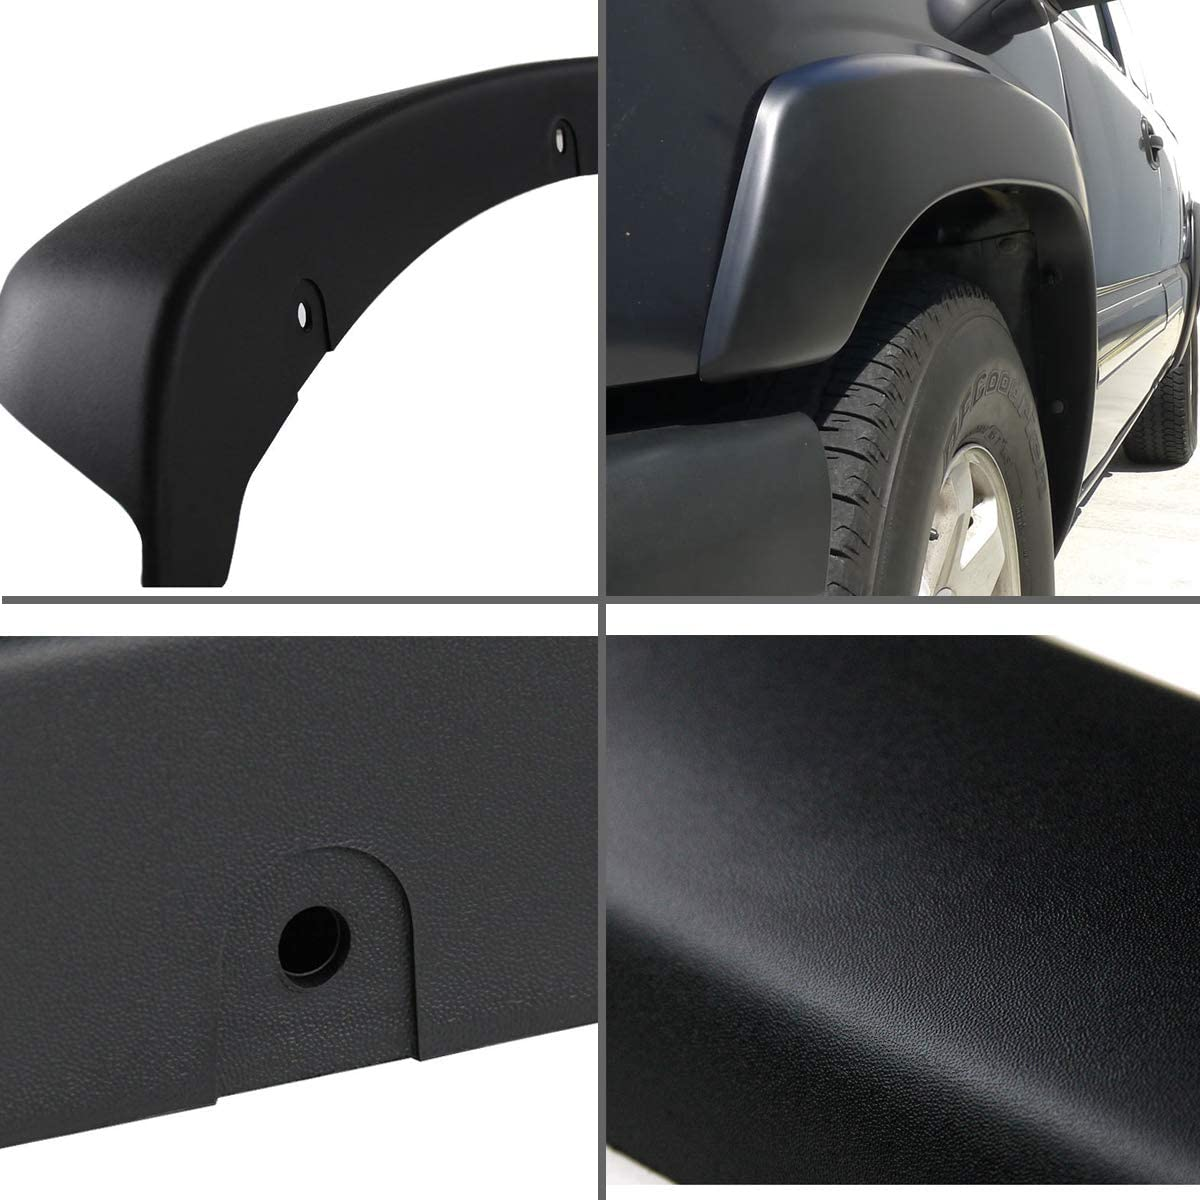 VioletLisa 4pcs Fleetside Fender Flare Easy Install For 1999-2006 Chevrolet Silverado//GMC Sierra 1500//2500//3500 /& 2000-2006 Chevrolet Avalanche//Suburban 1500//2500 /& 2000-2006 GMC Yukon XL 1500//2500